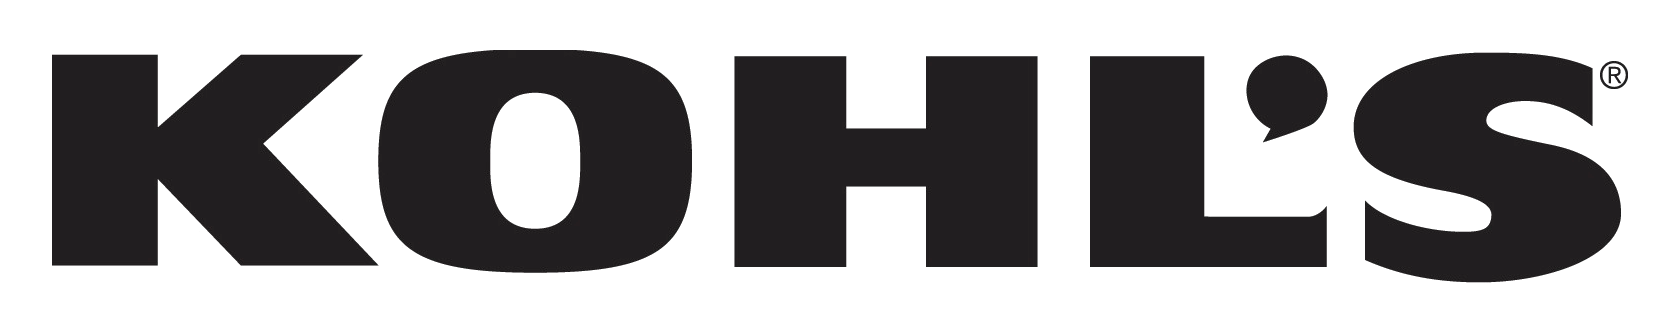 PNGPIX-COM-Kohls-Logo-PNG-Transparent.png